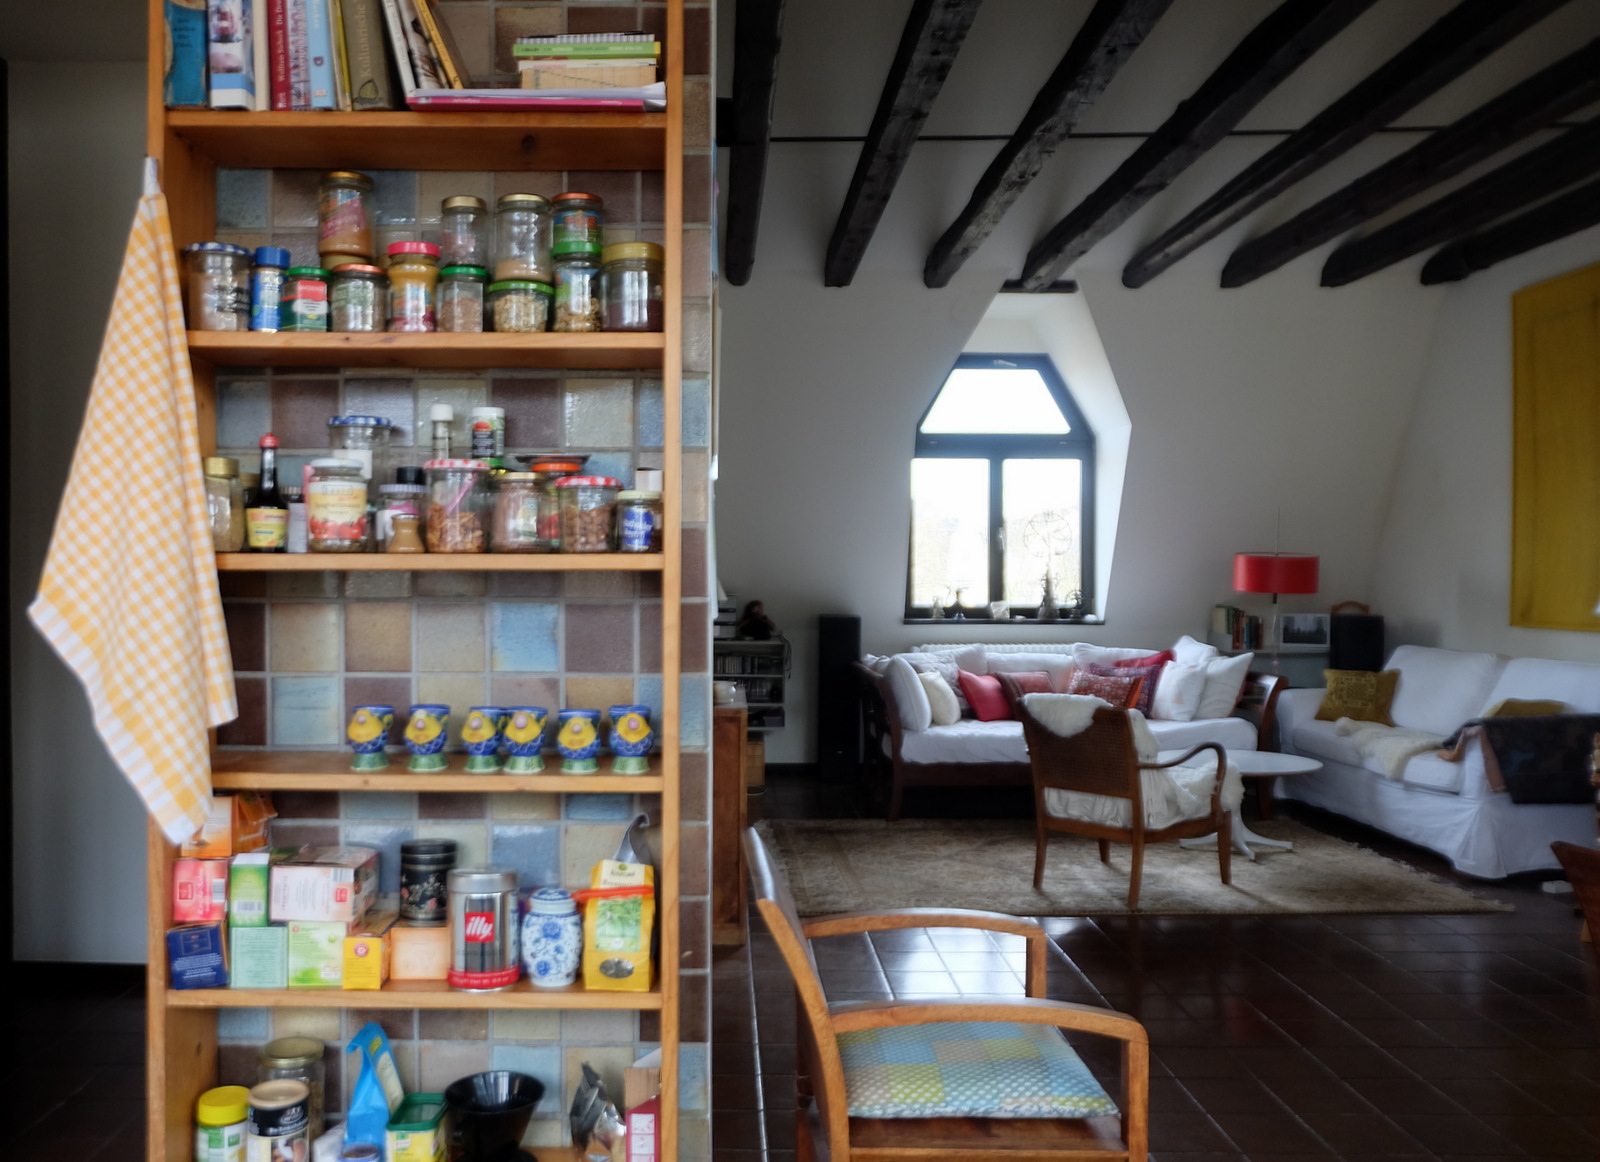 dscf1529 Roof apartment %Bockenheim